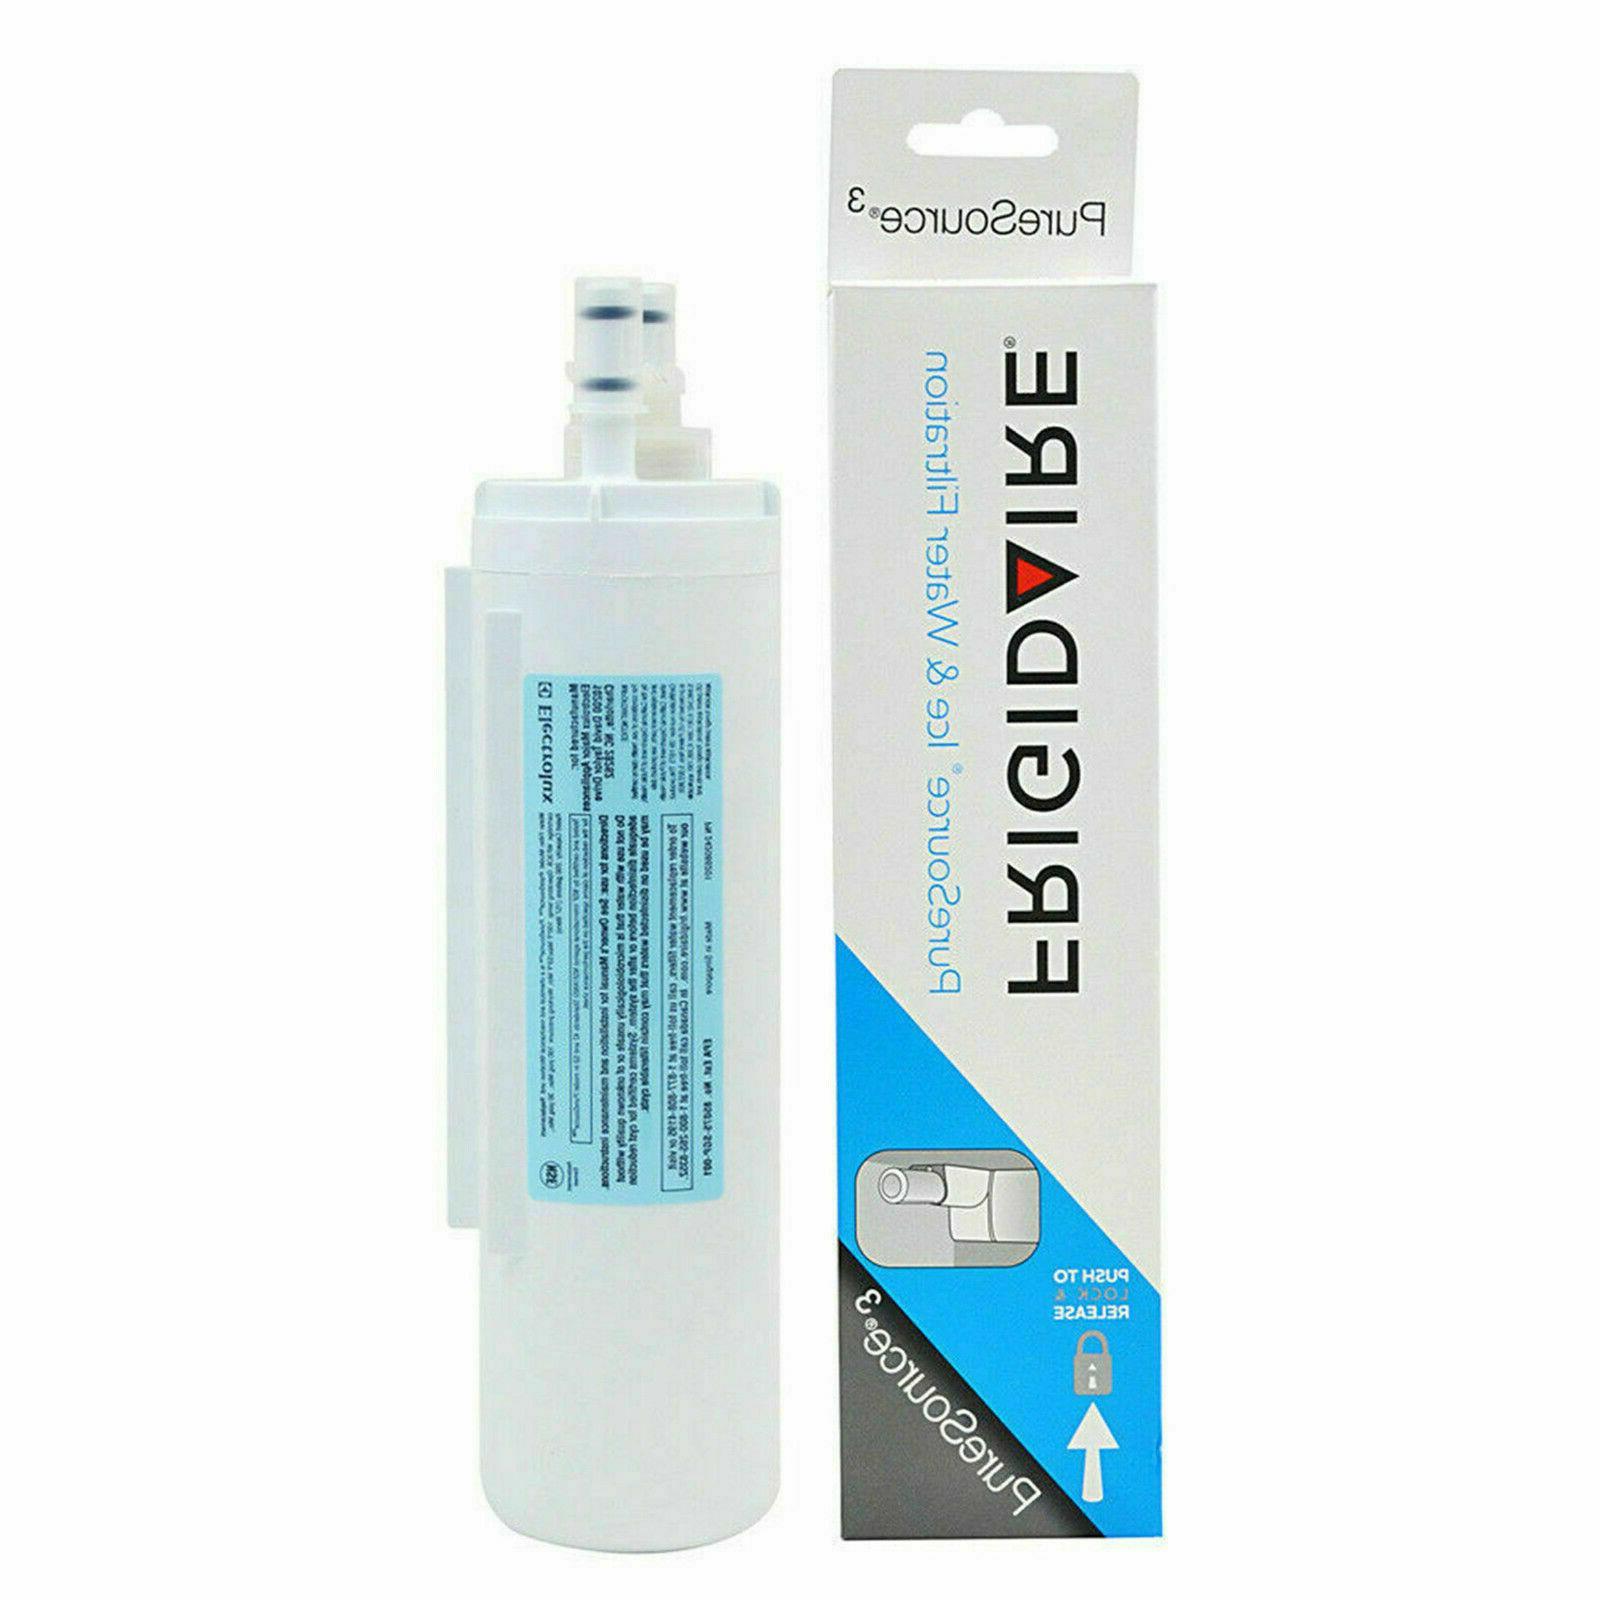 Frigidaire Puresource 3 WF3CB Refrigerator Water Filter